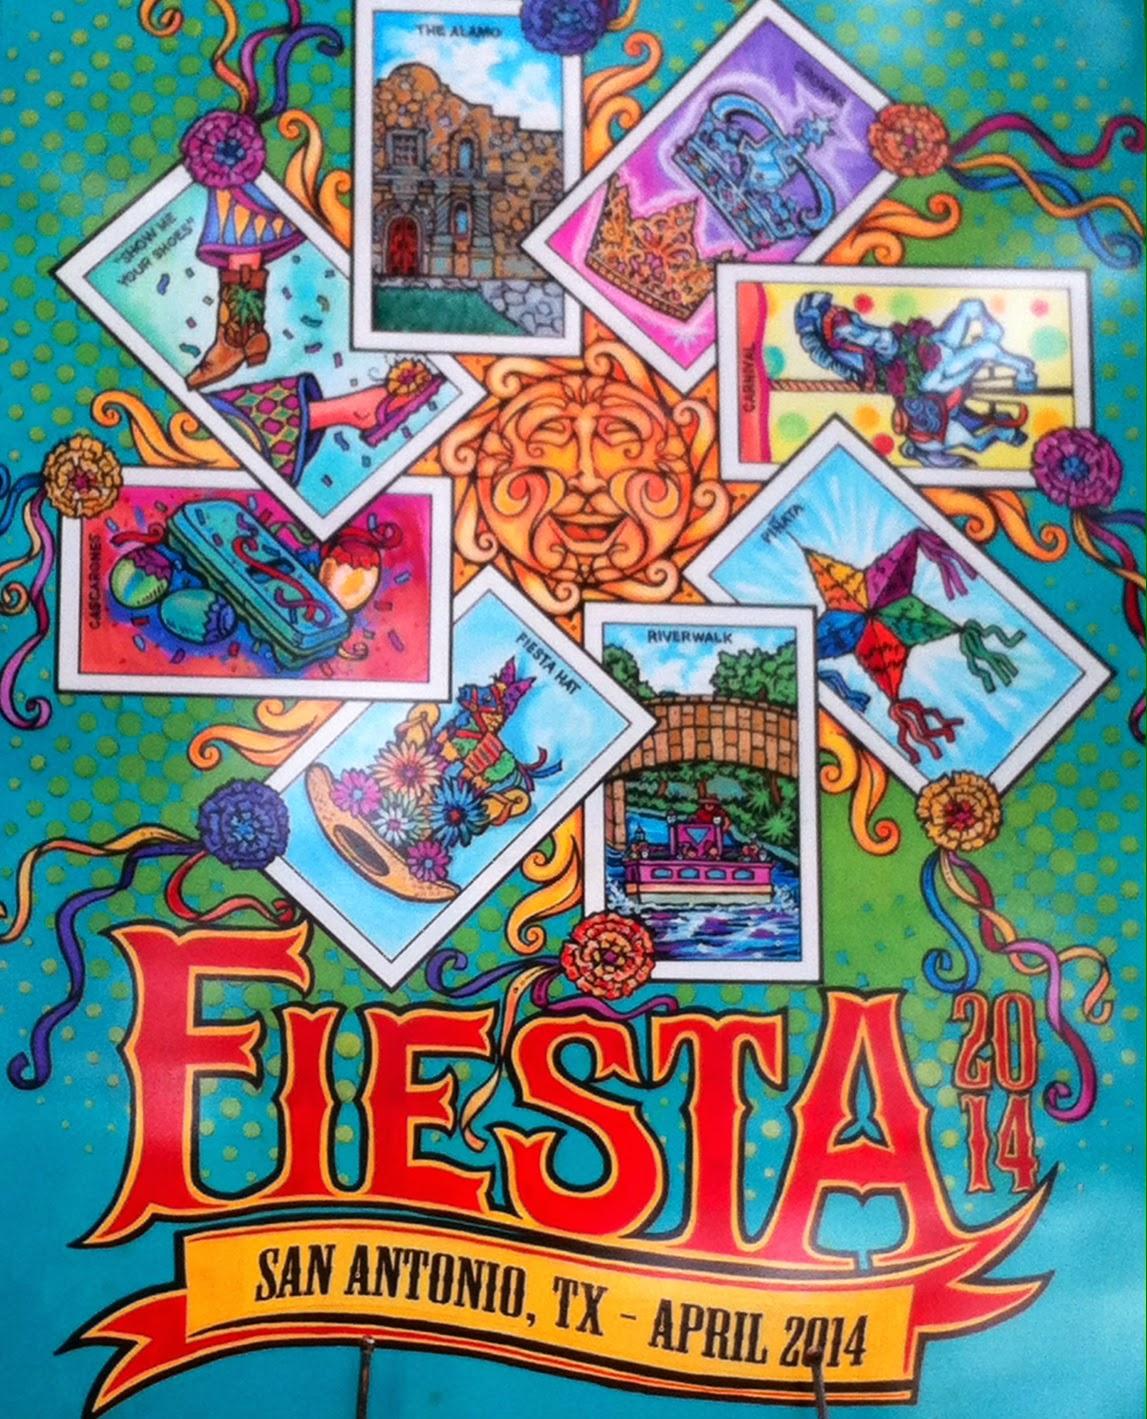 San Antonio Rocks Fiesta 2014 Tickets Go On Sale Now